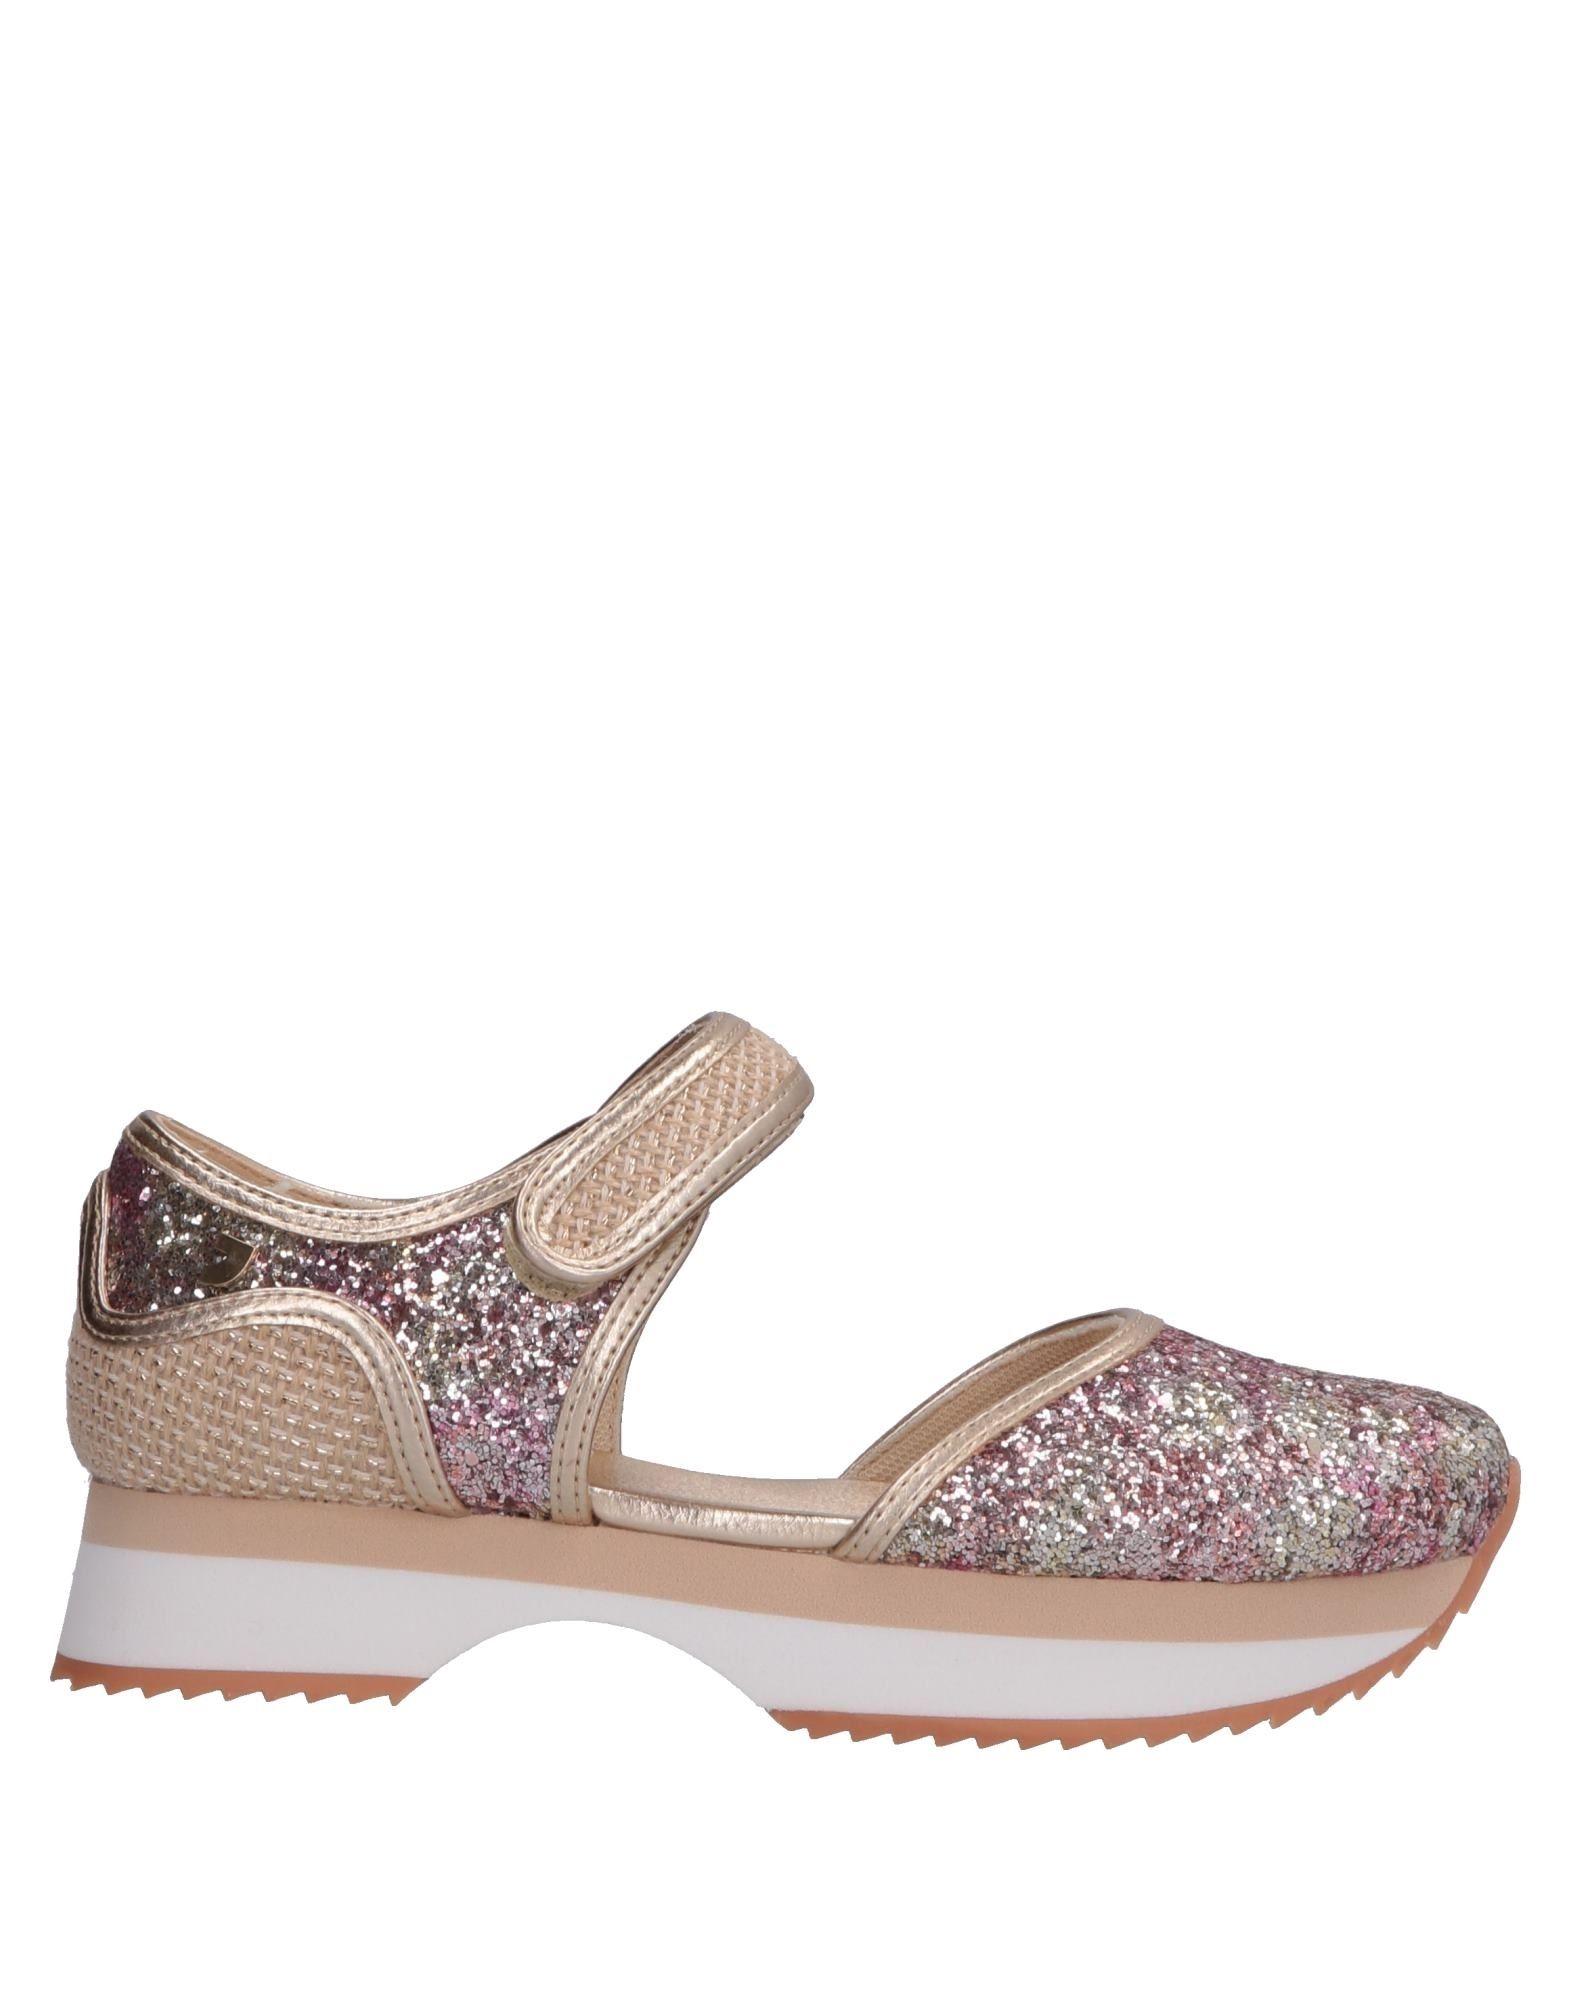 Gioseppo Sneakers - Women Gioseppo Sneakers online - on  United Kingdom - online 11575743QR 41f3b1